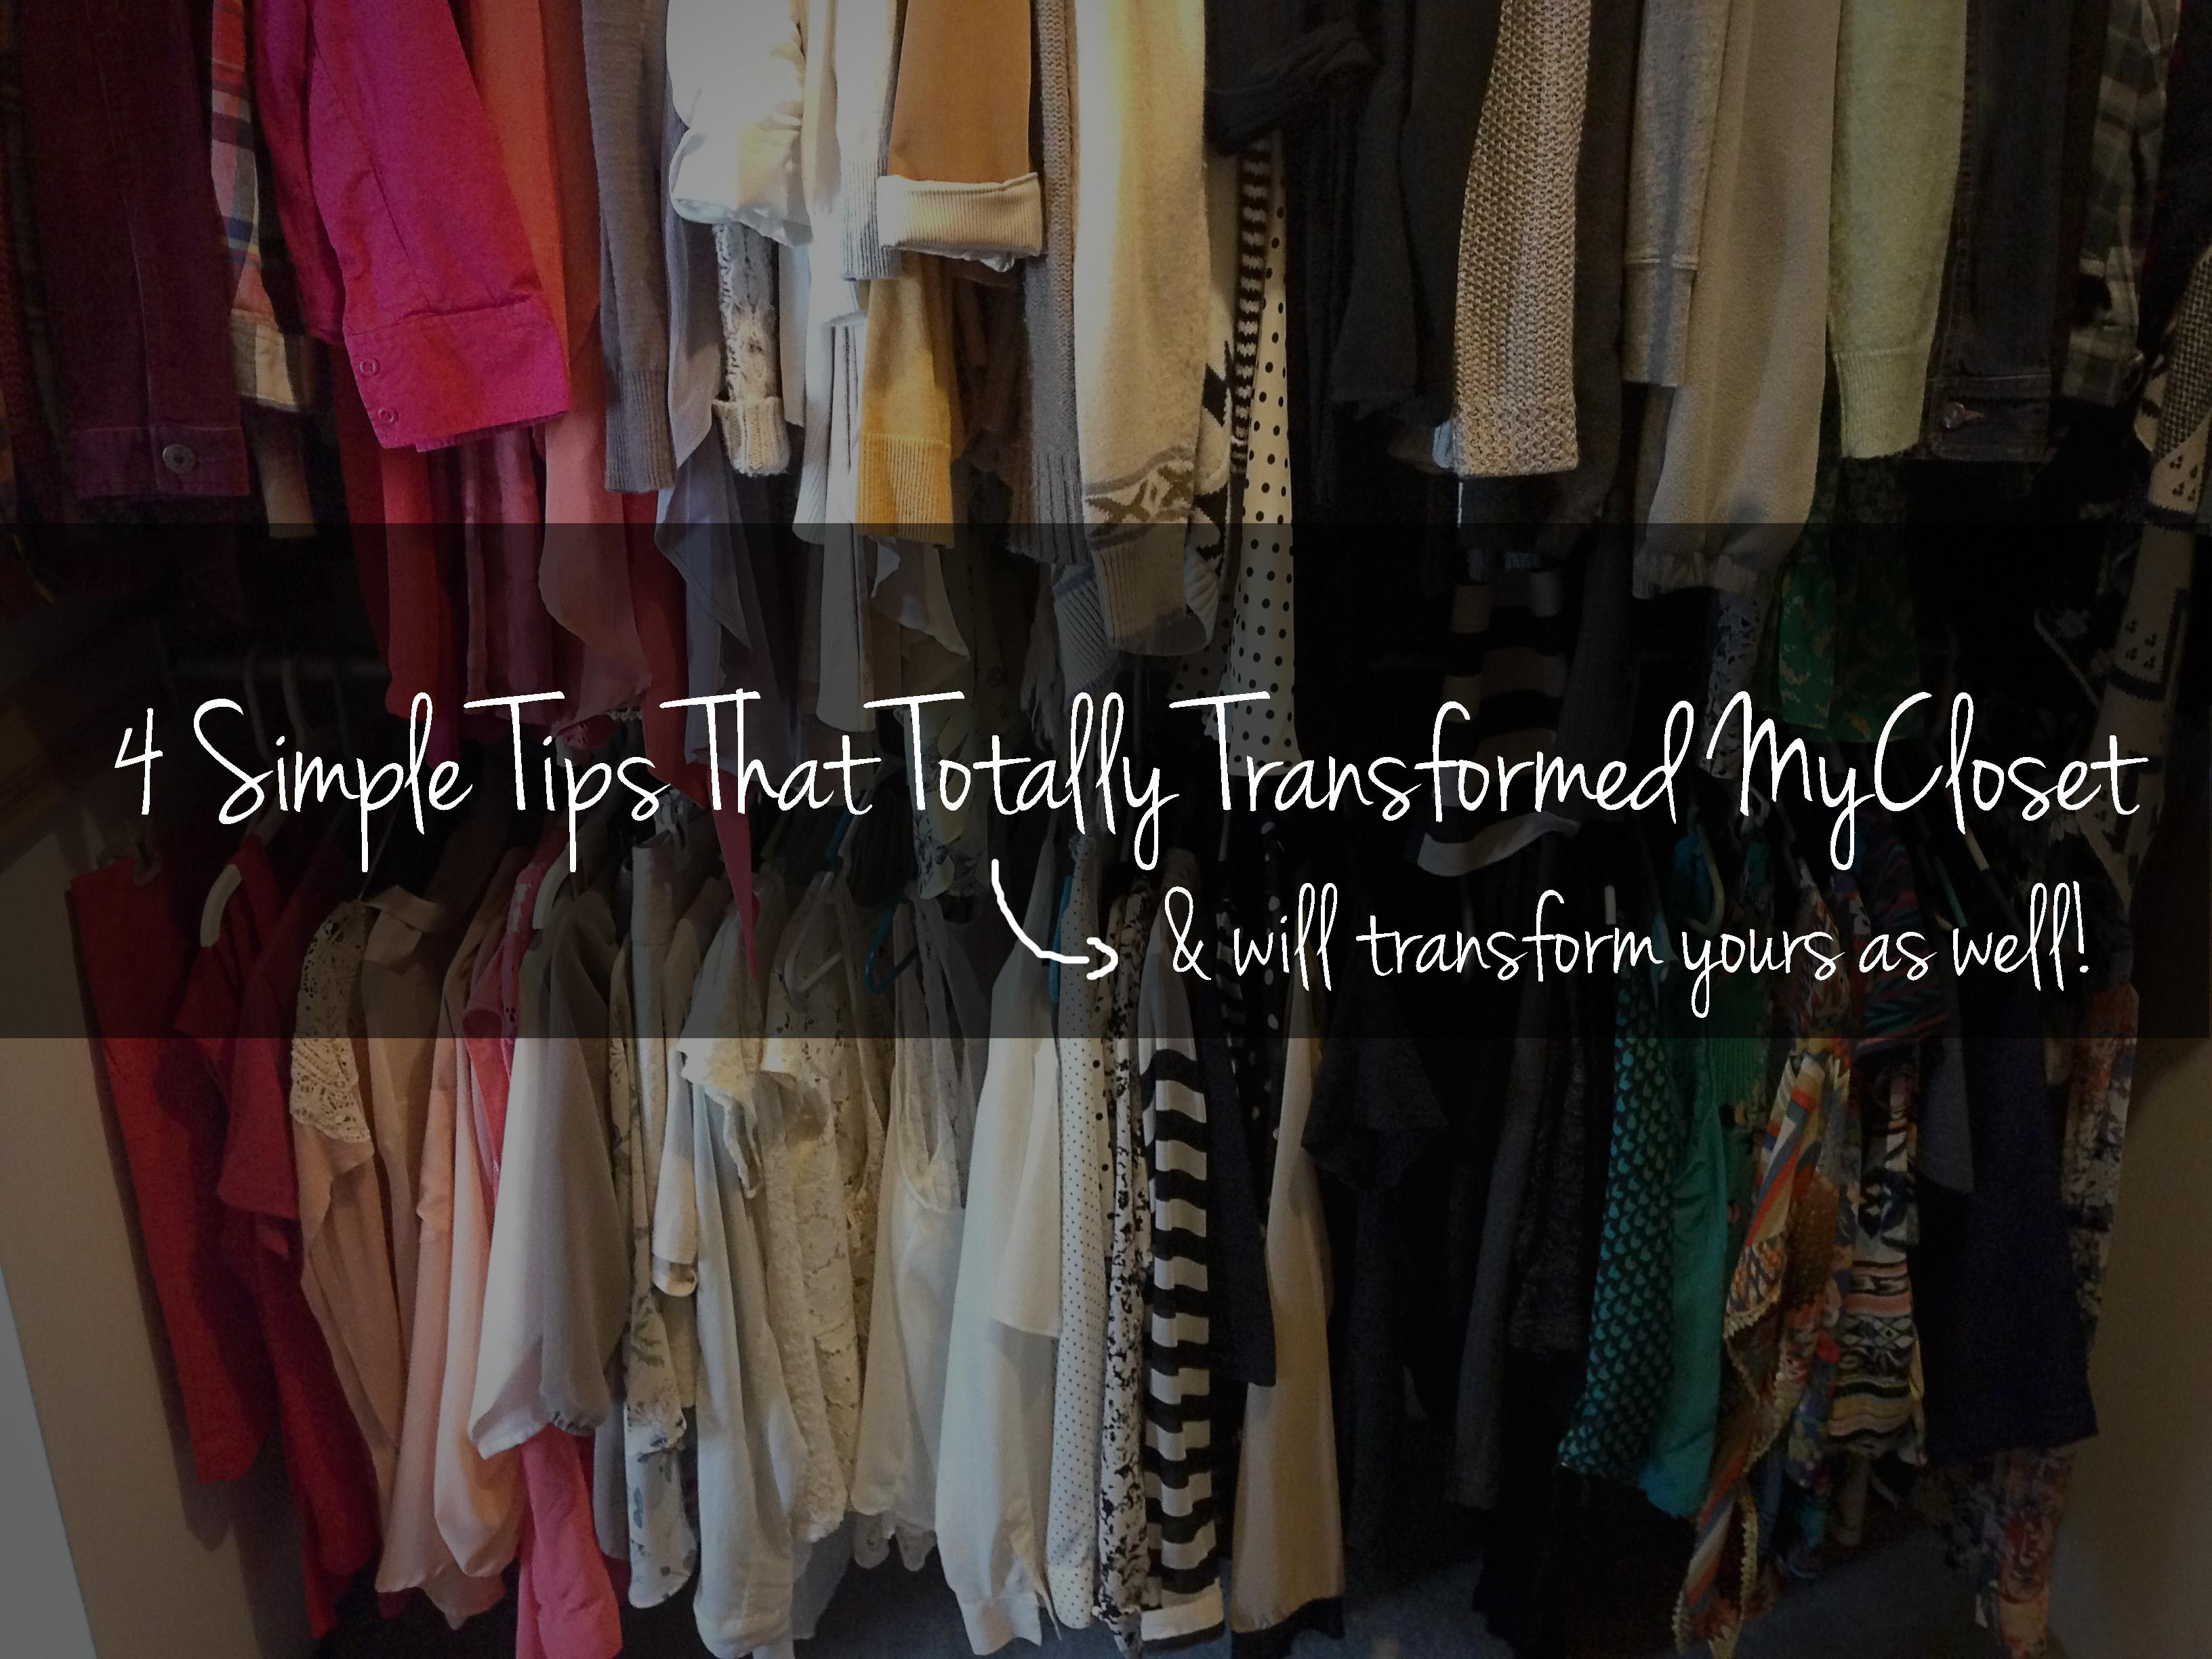 4 tips to transform your closet